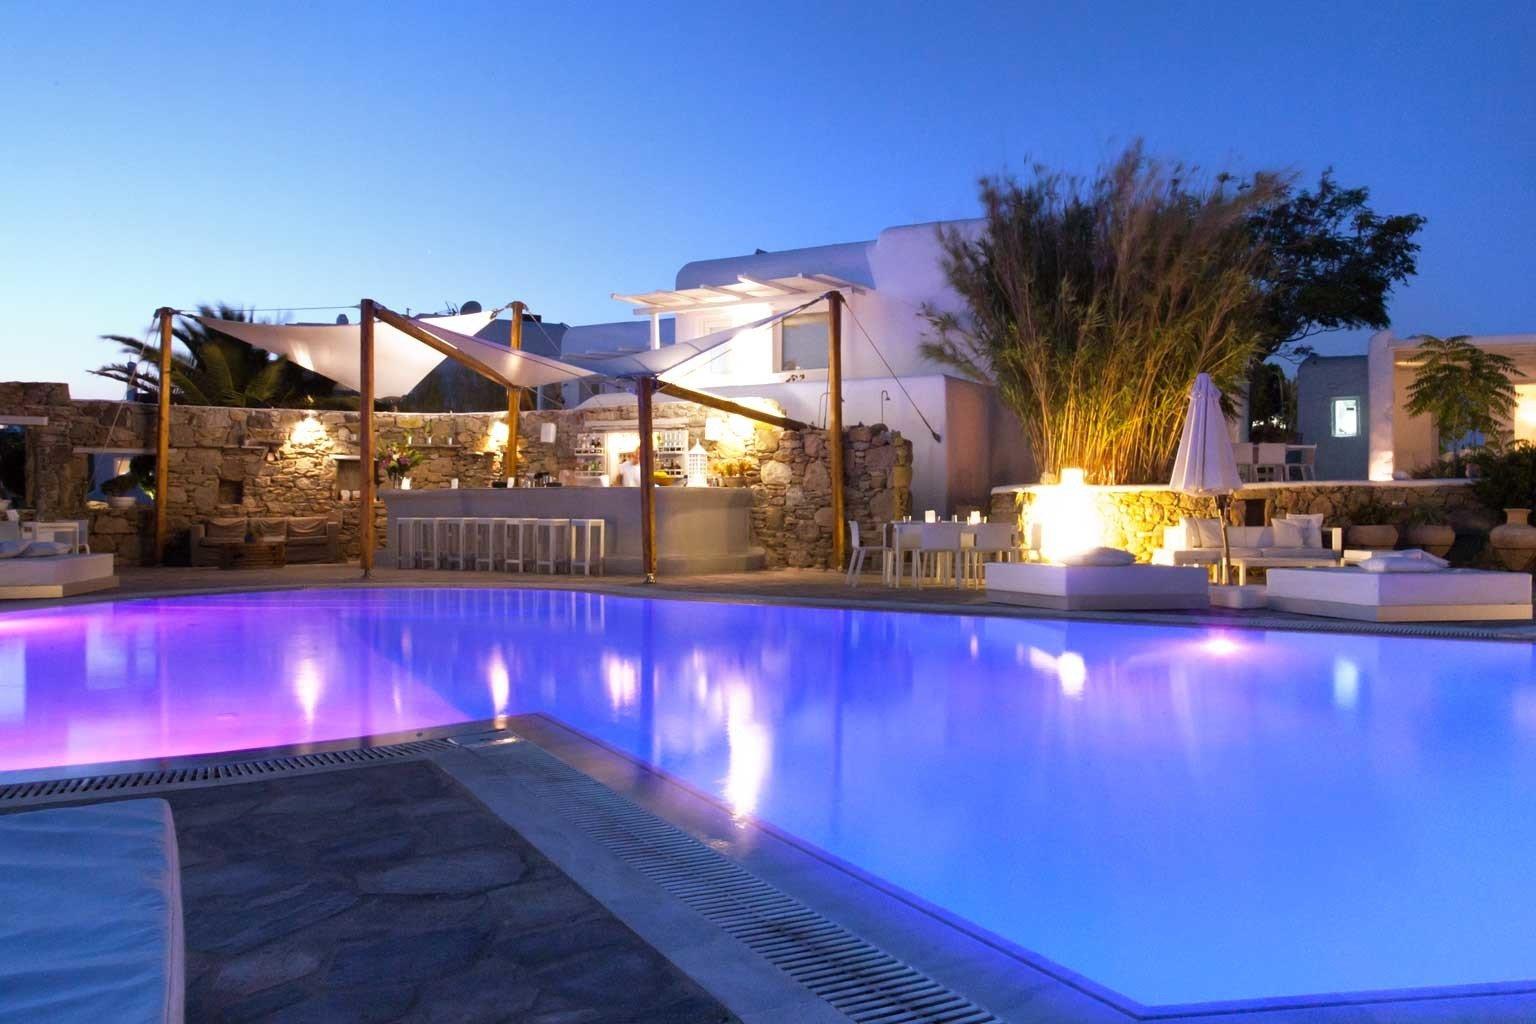 Exterior Lounge Luxury Modern Pool sky swimming pool property leisure Resort reflecting pool Villa backyard condominium